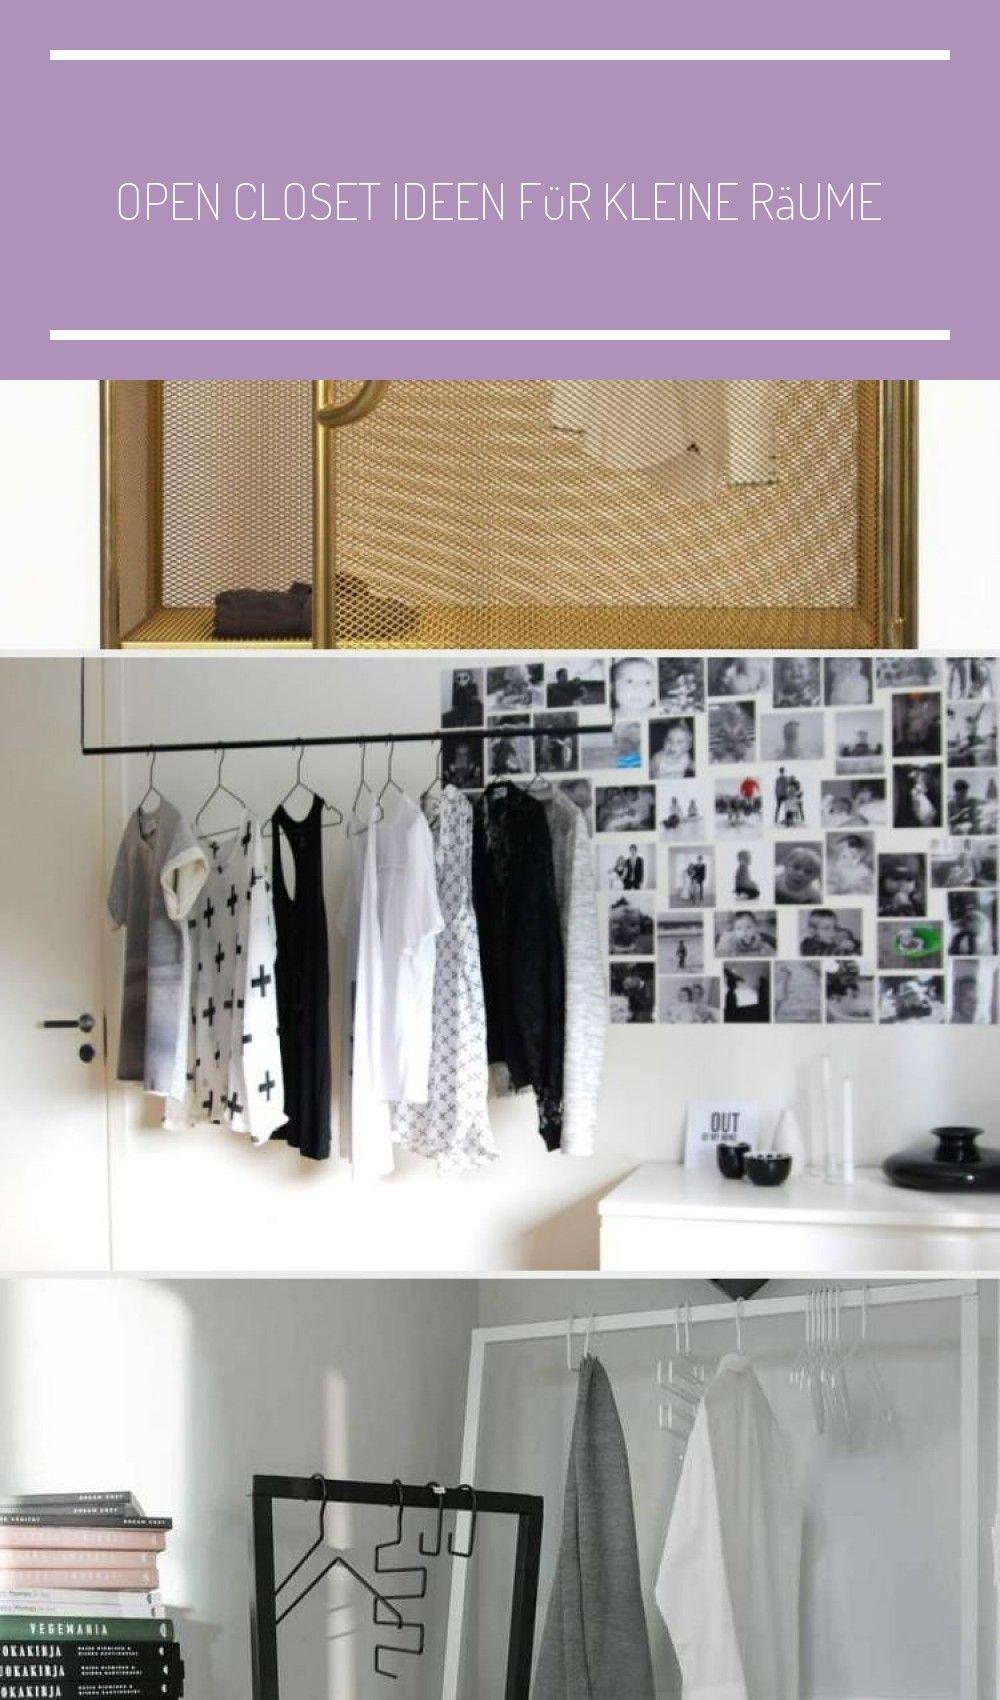 Open Closet Ideen Fur Kleine R In 2020 With Images Open Closet Wardrobe Rack Motif Design